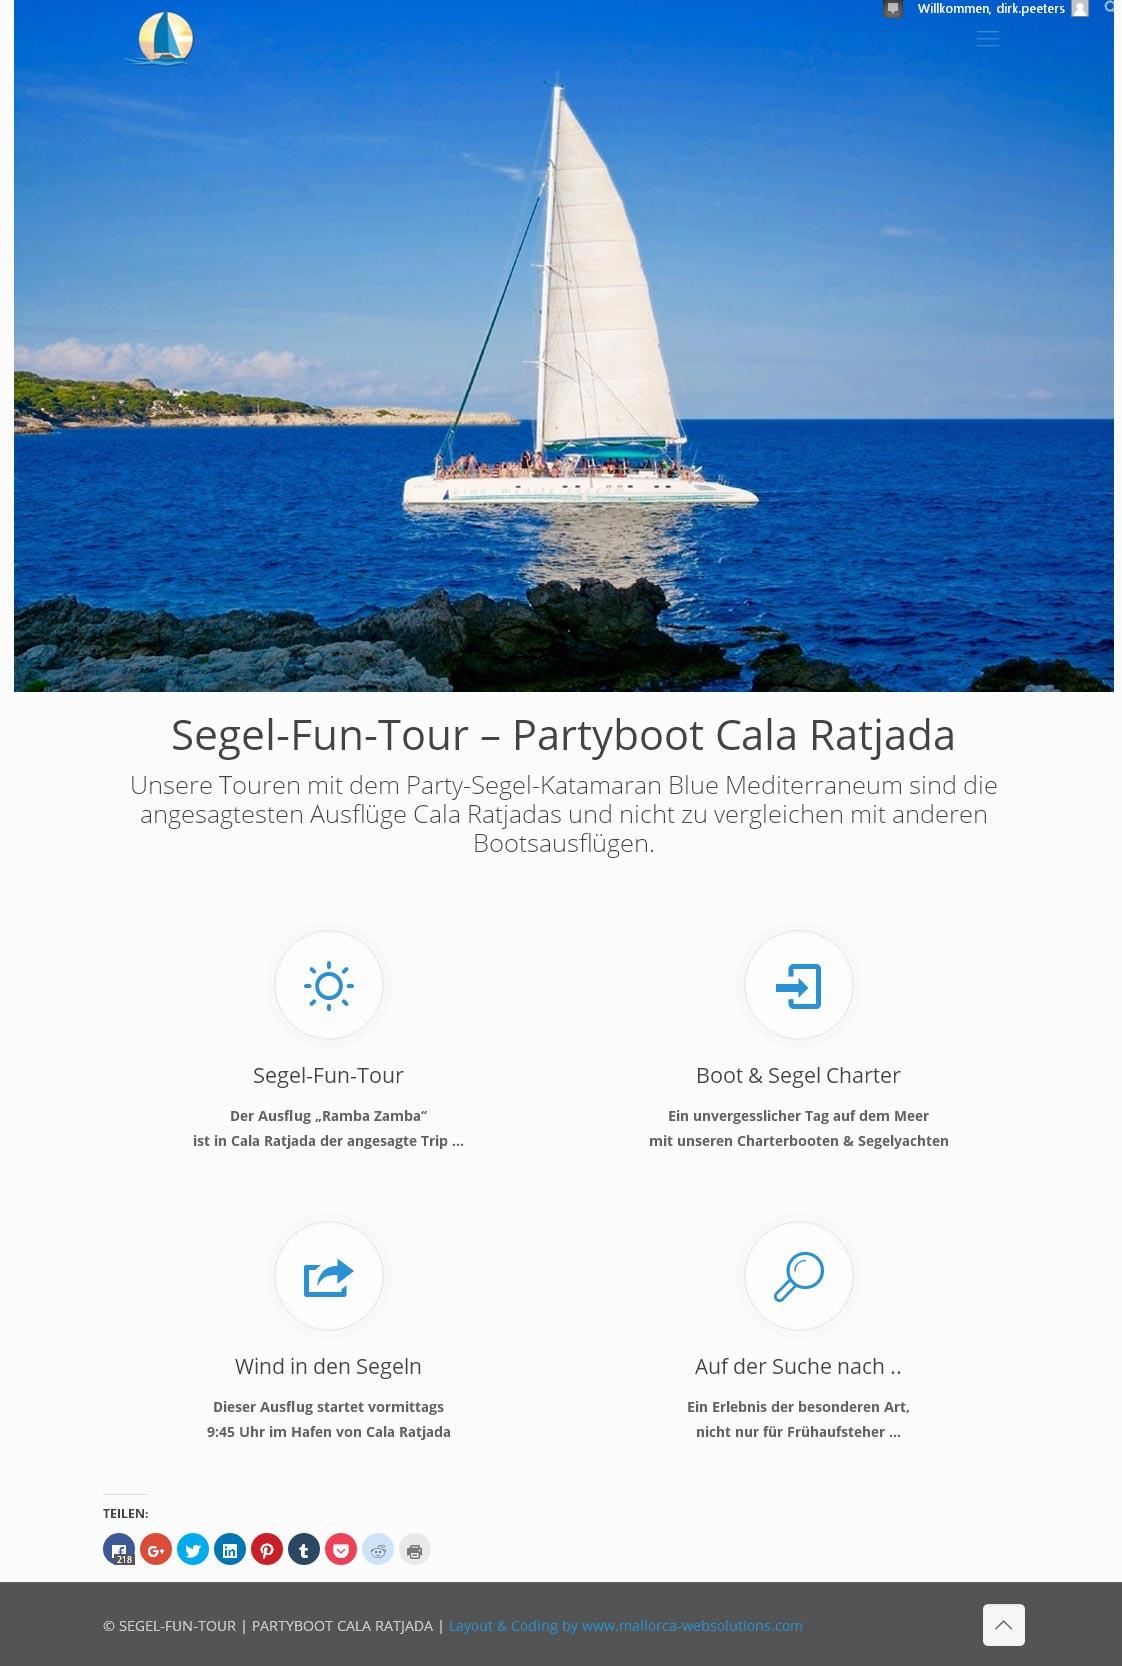 Partyboot Cala Ratjada<br /> Entwicklung der CI, Grafik & Layout für Online<br />www.partyboot-calaratjada.com